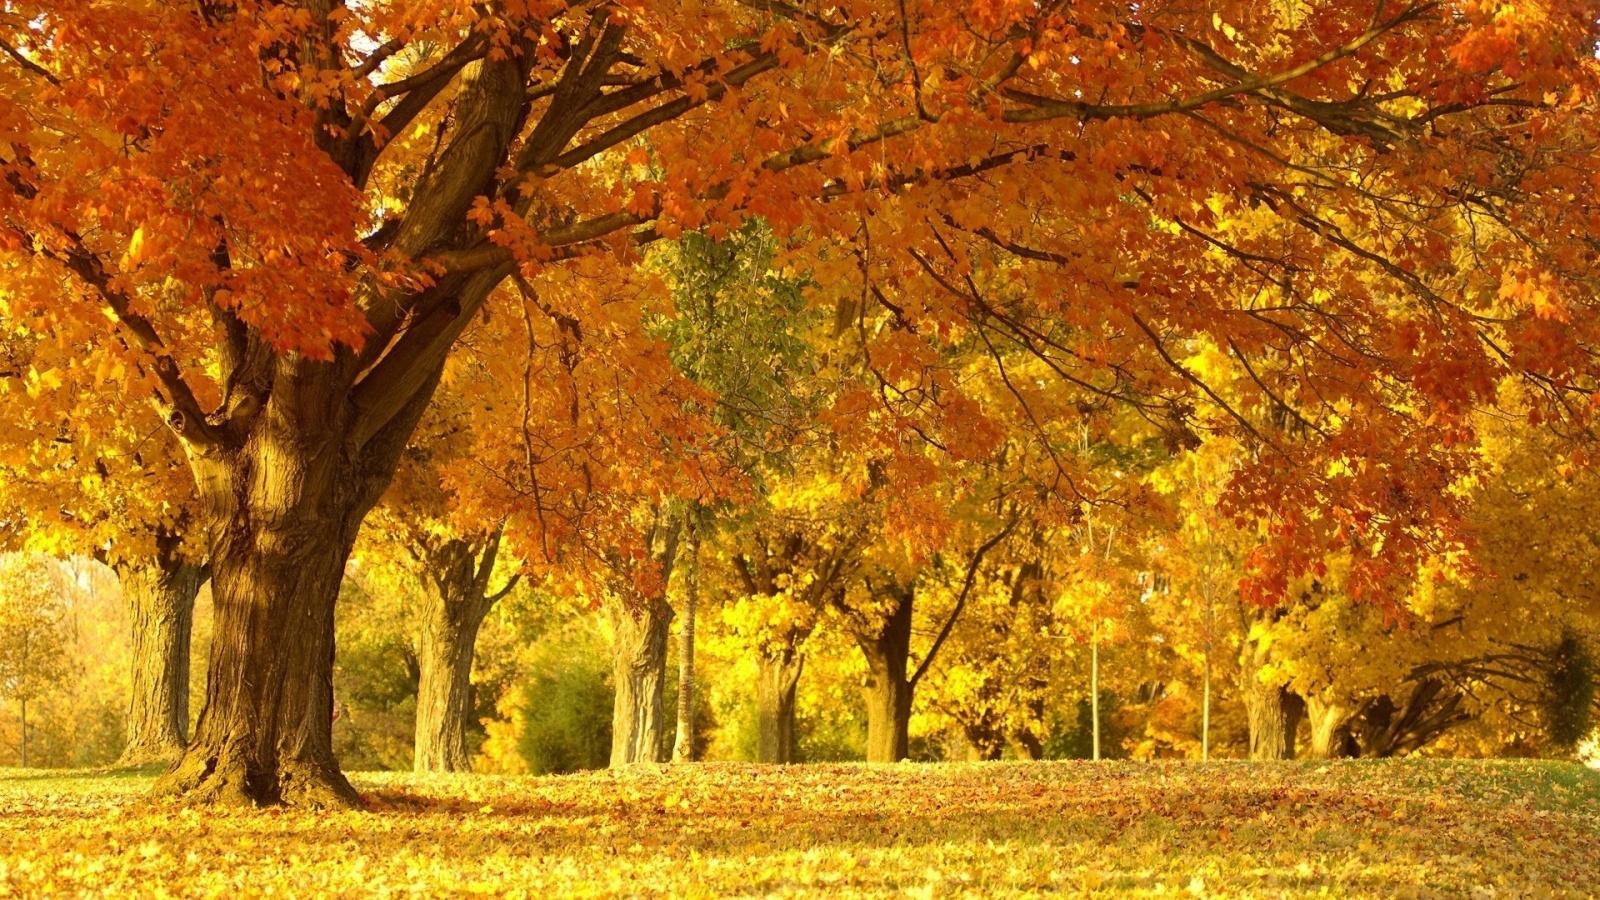 Autumn Scenery Wallpaper 1600x900 26726